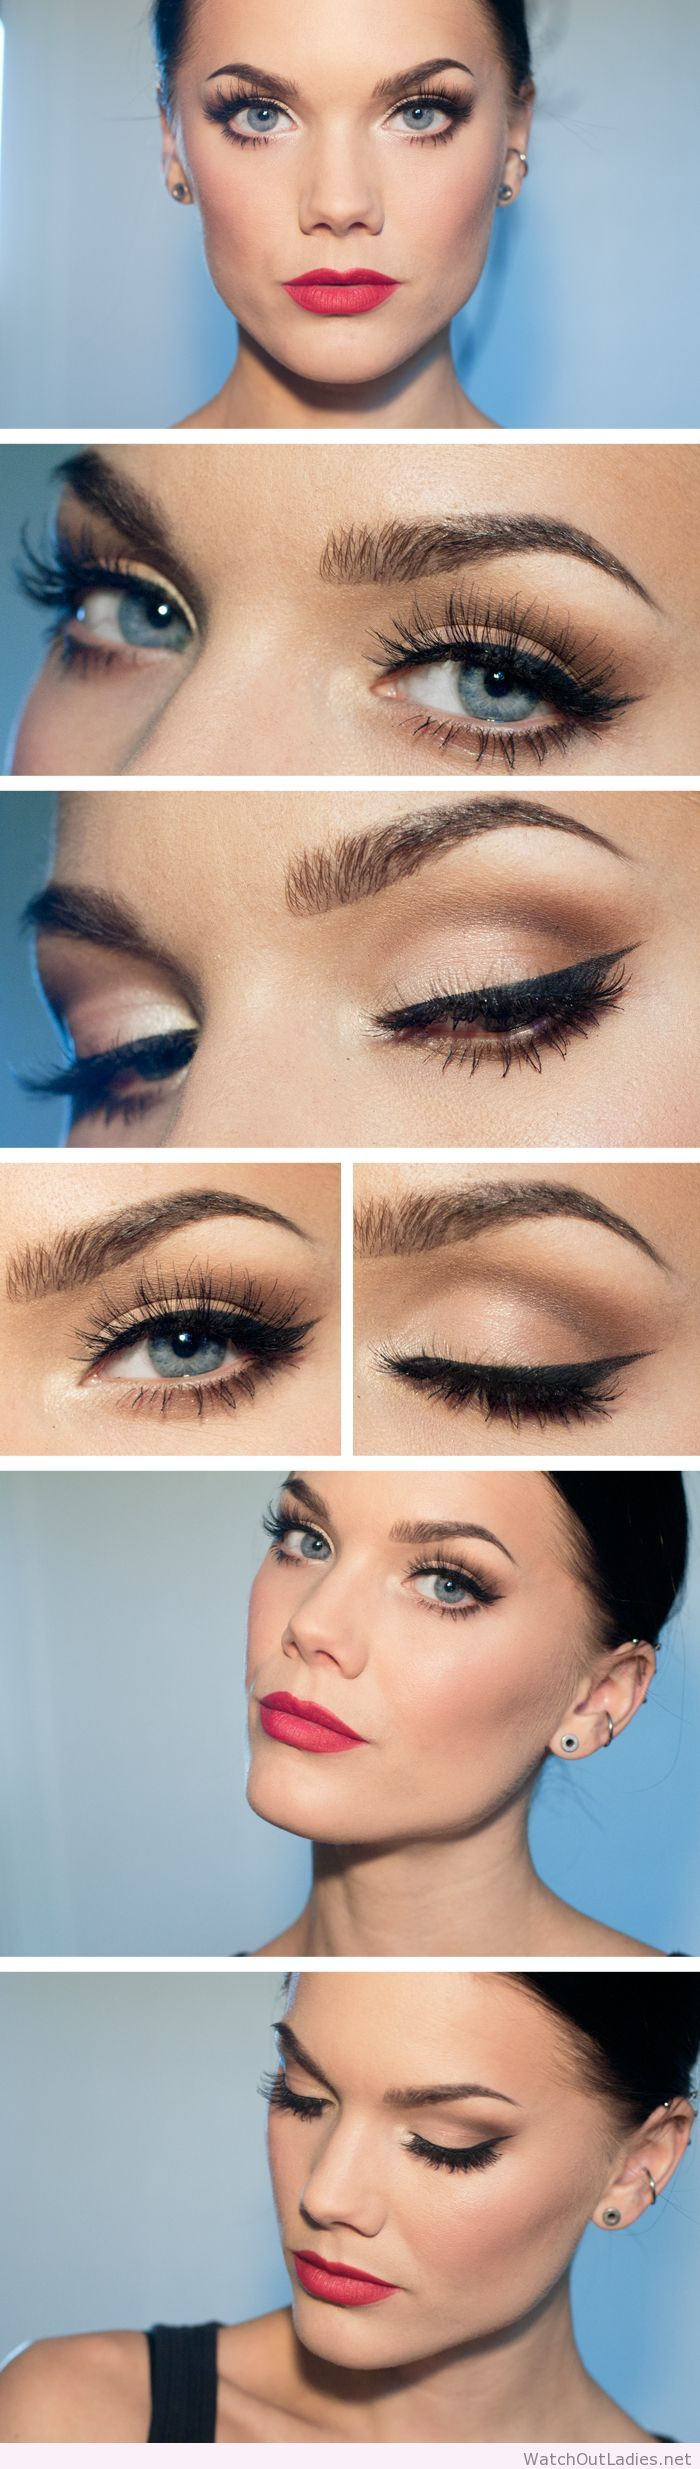 Linda Hallberg lady makeup, nude eye makeup and red lips